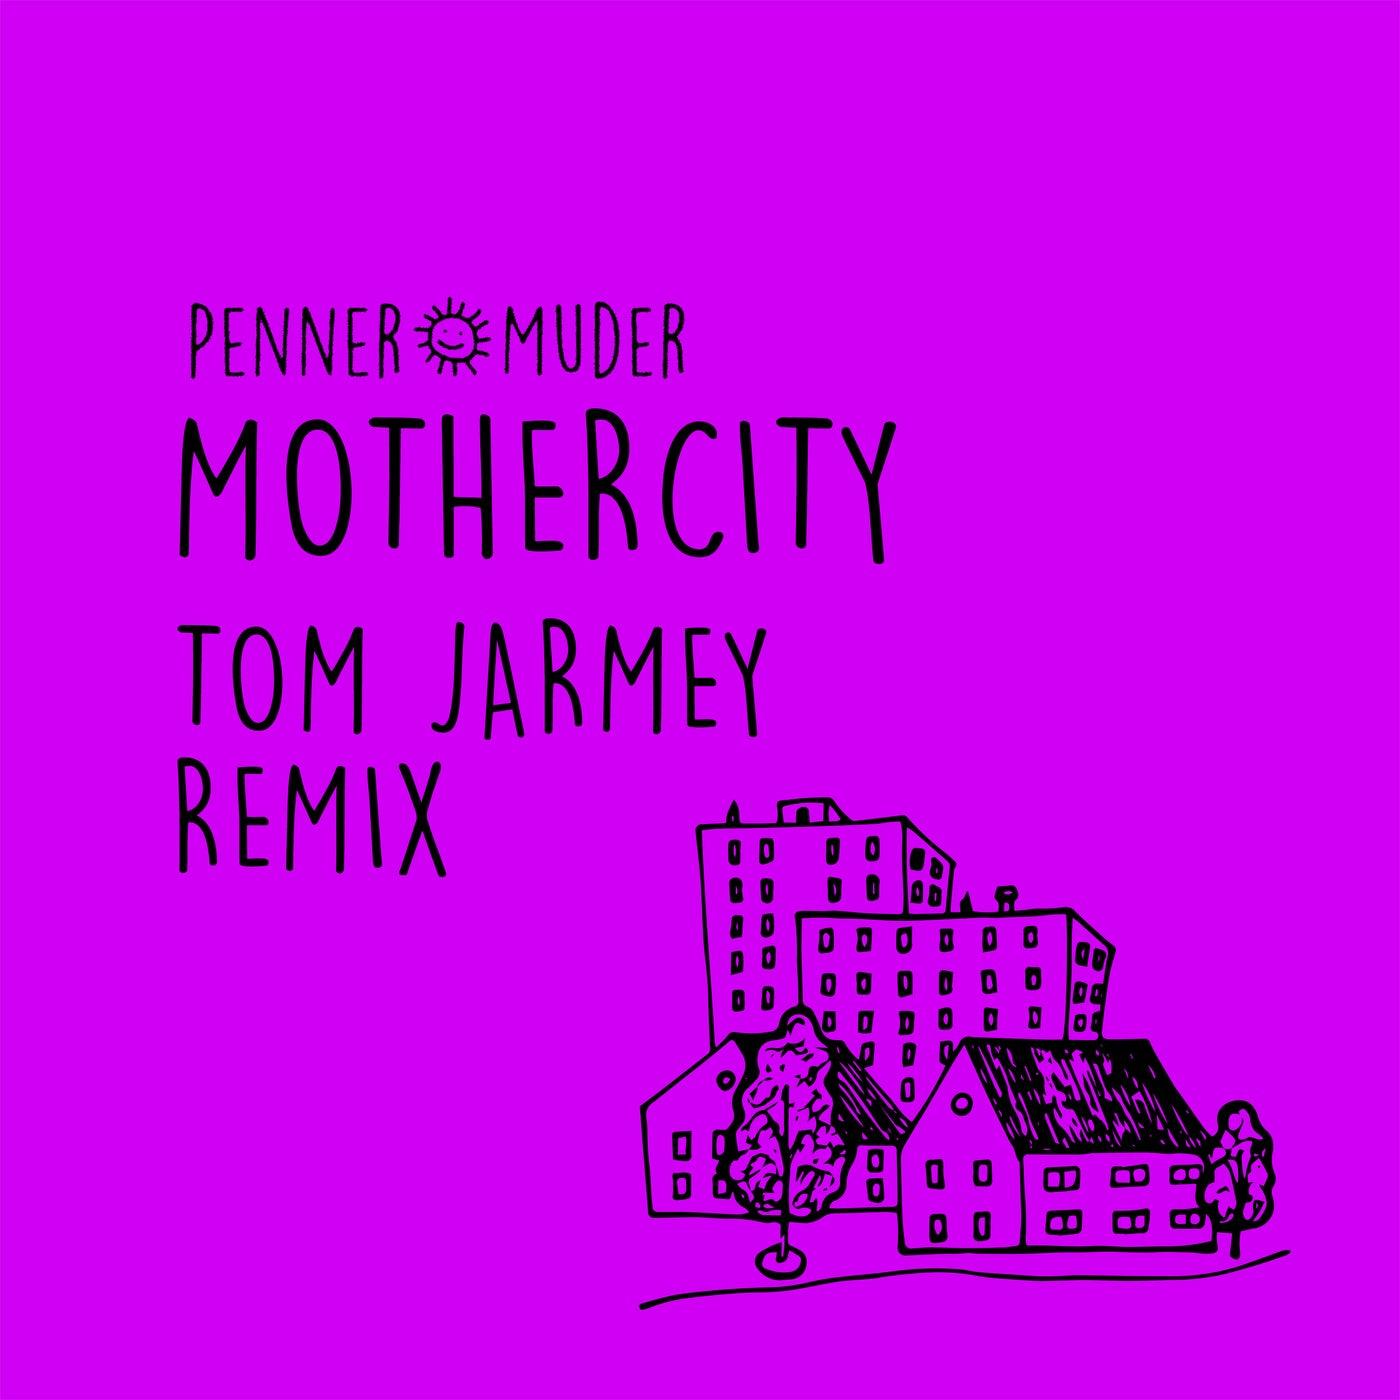 Mothercity (Tom Jarmey Remix)